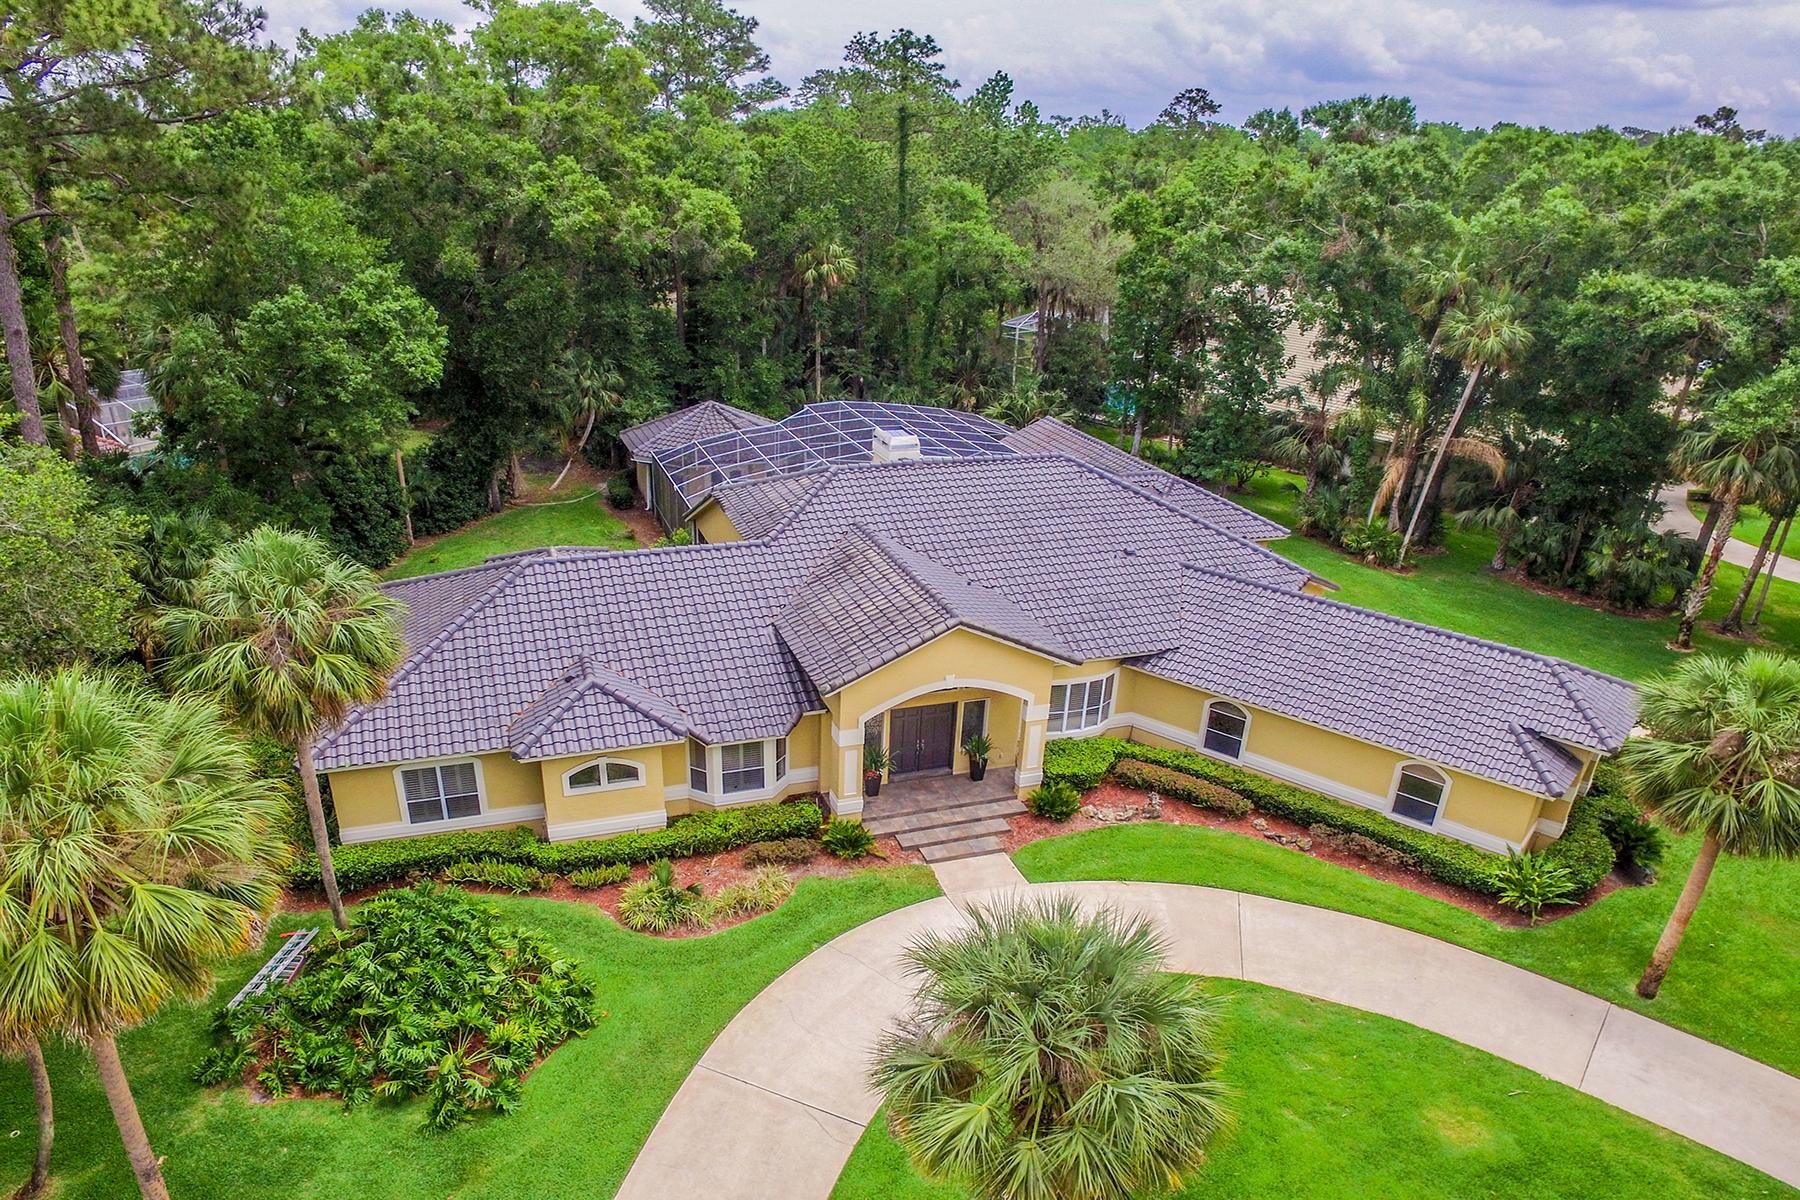 Enfamiljshus för Försäljning vid ORLANDO - LONGWOOD 3161 Yattika Pl Longwood, Florida 32779 Usa